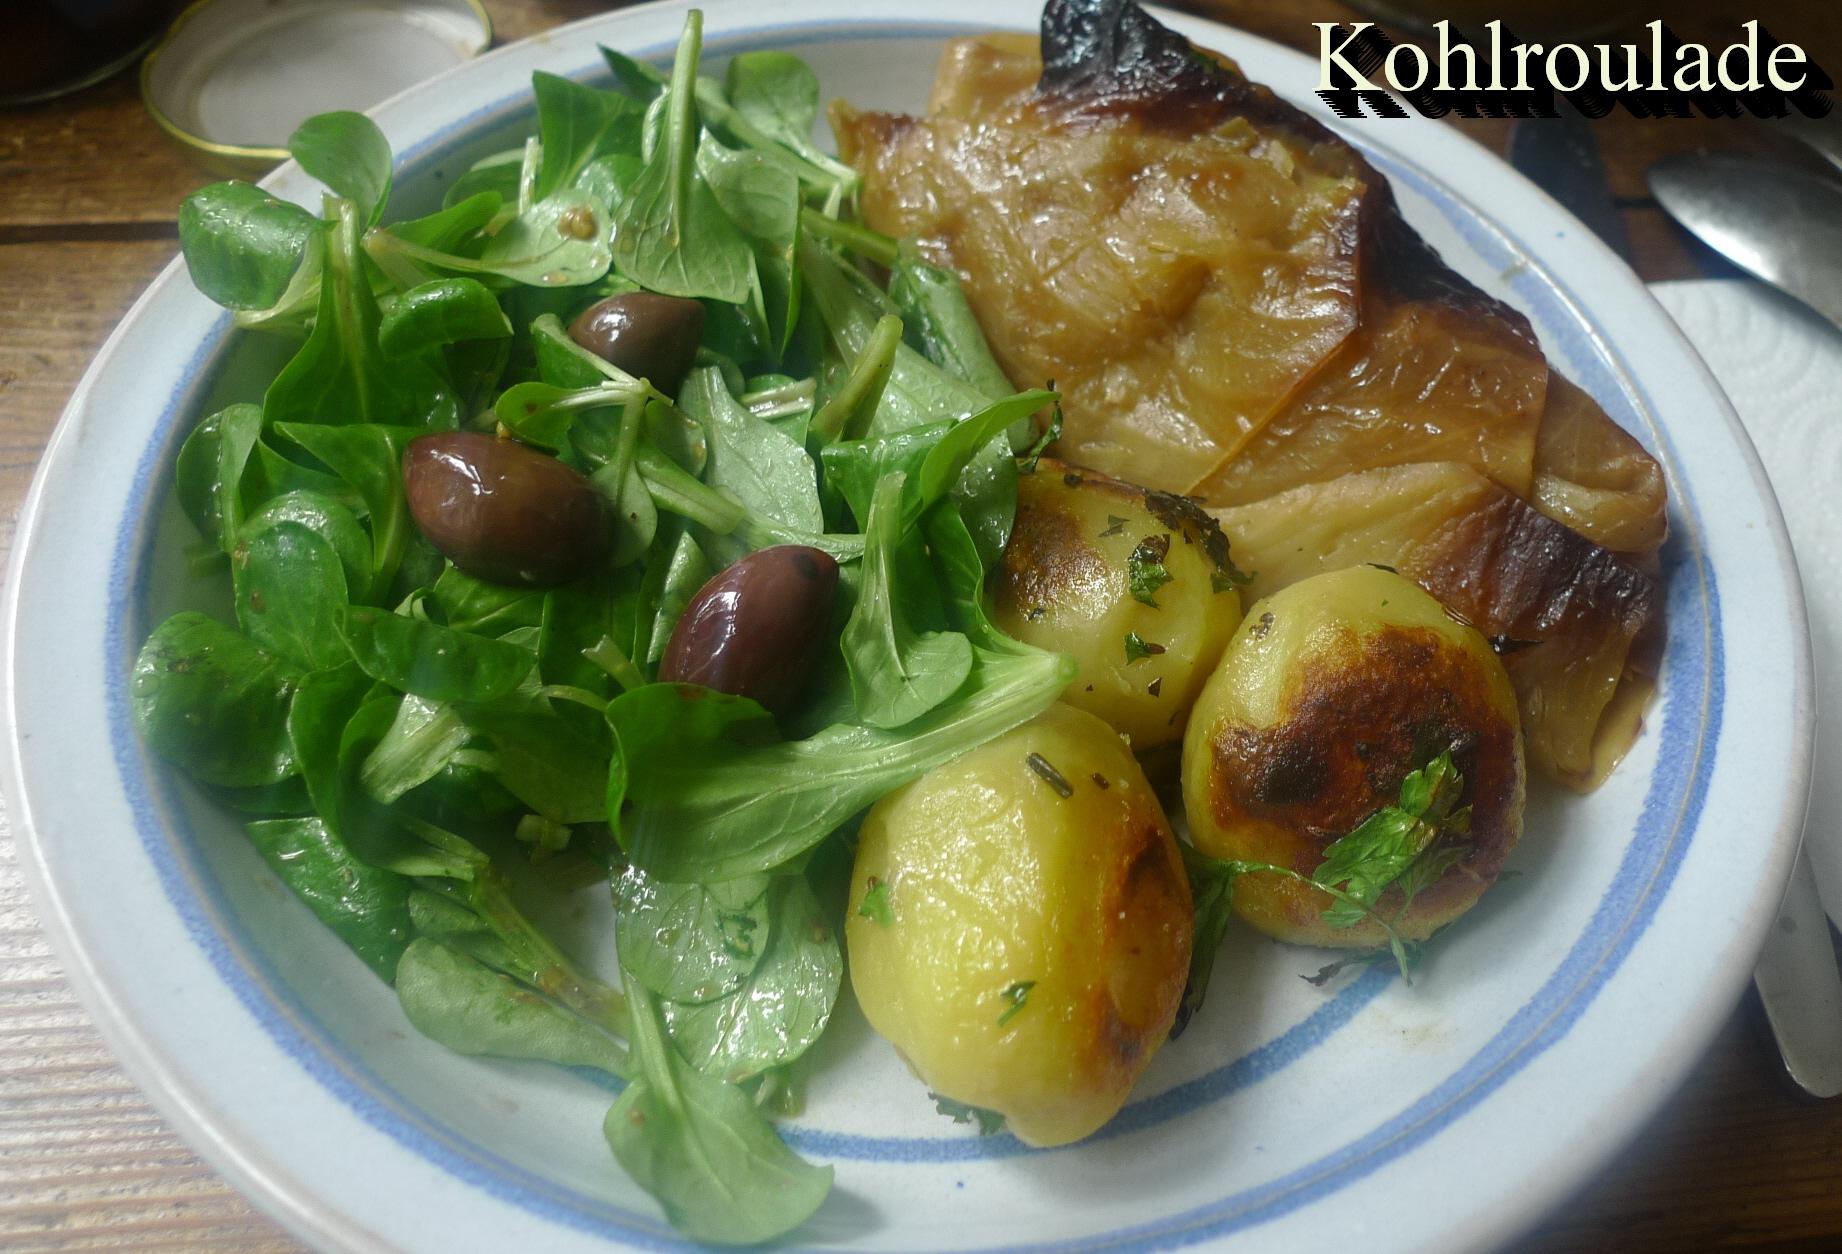 29.3.13-Kohlroulade-Kartoffel-Salat